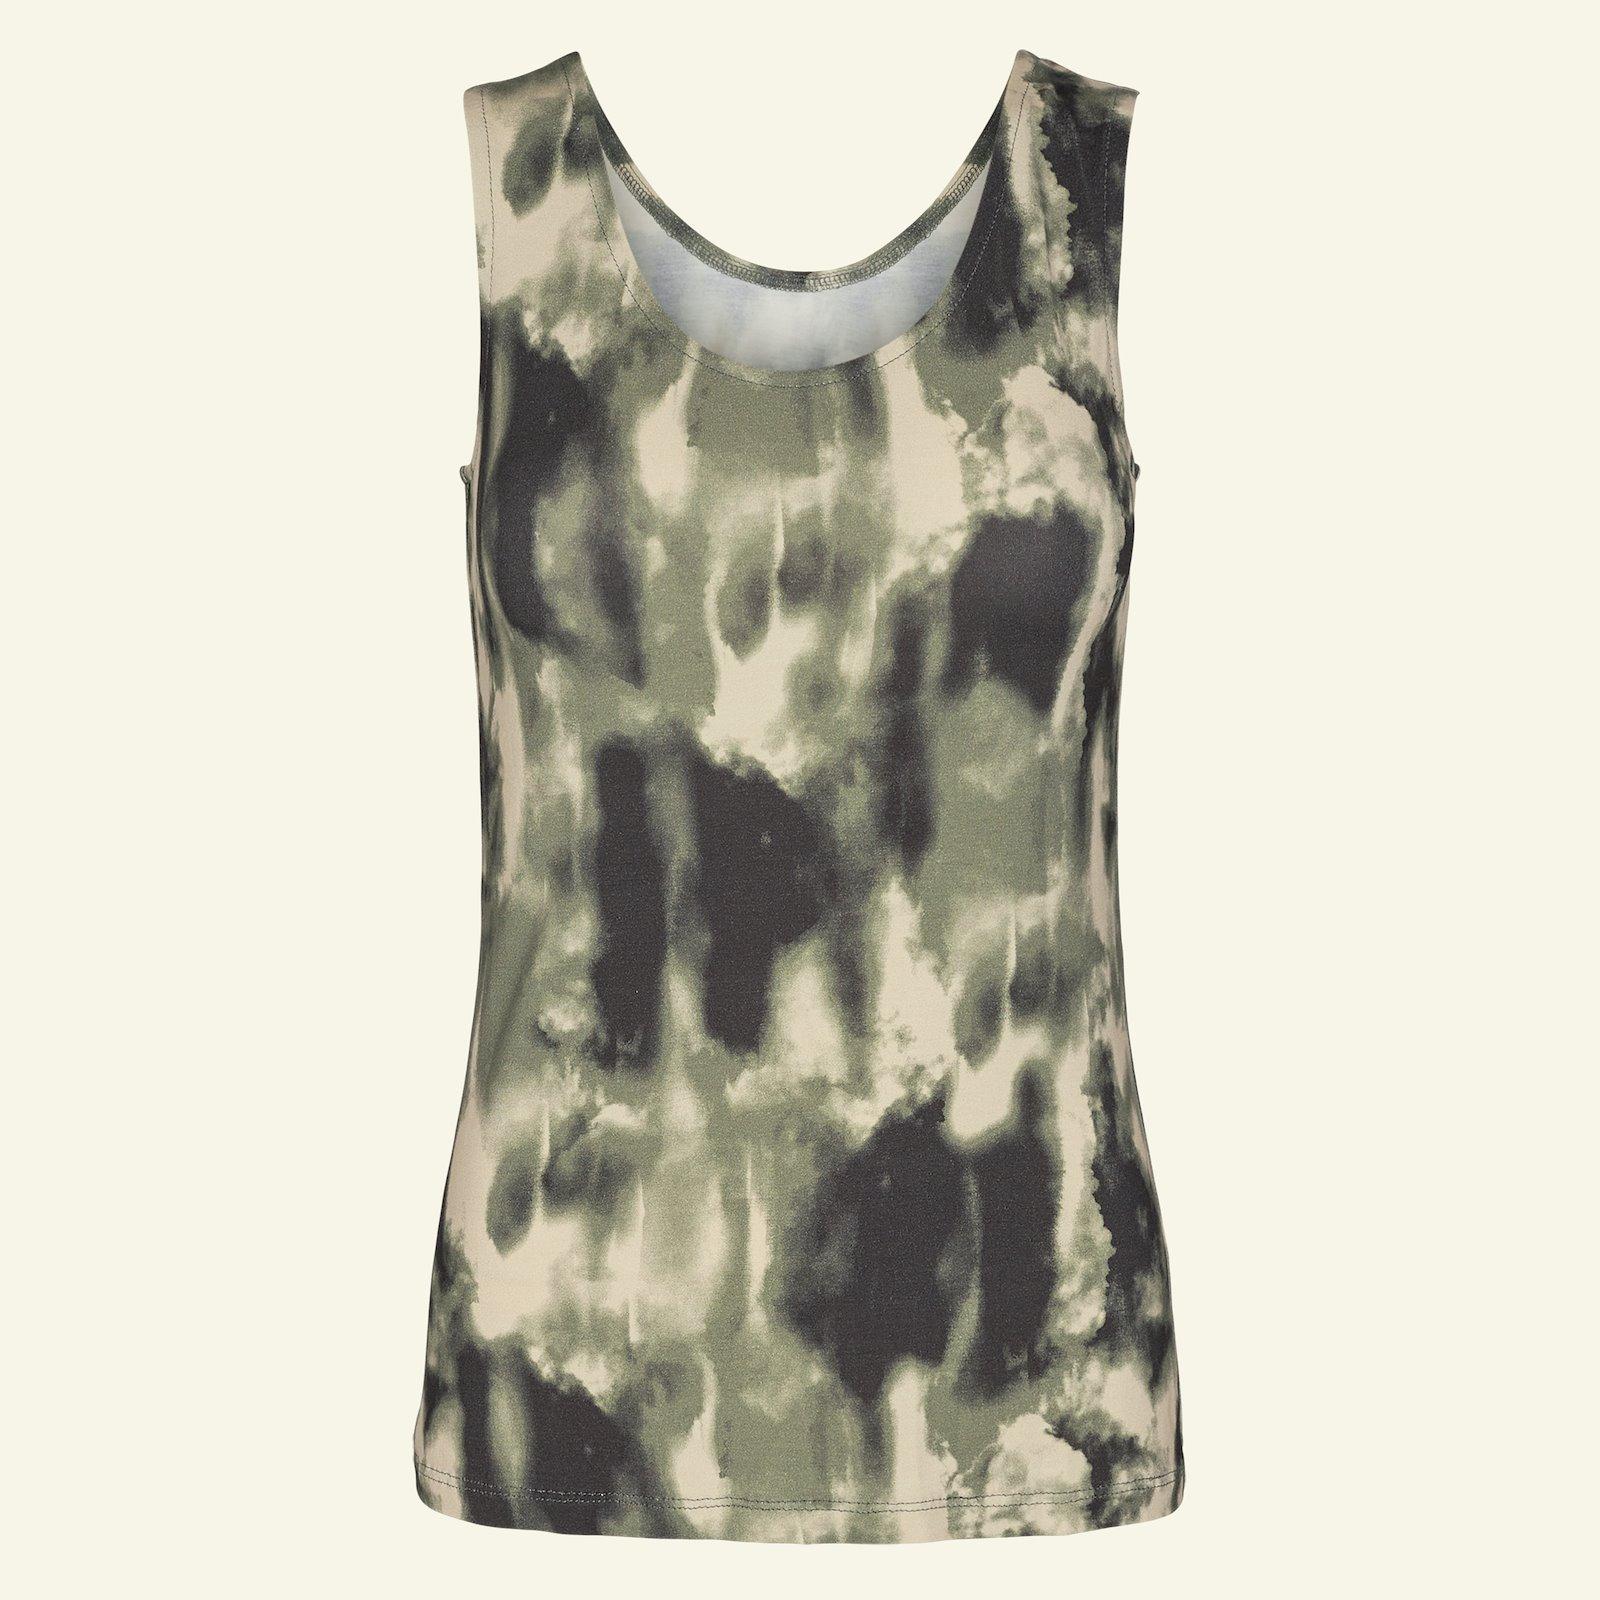 Top and dress, 46/18 p22071_272691_sskit